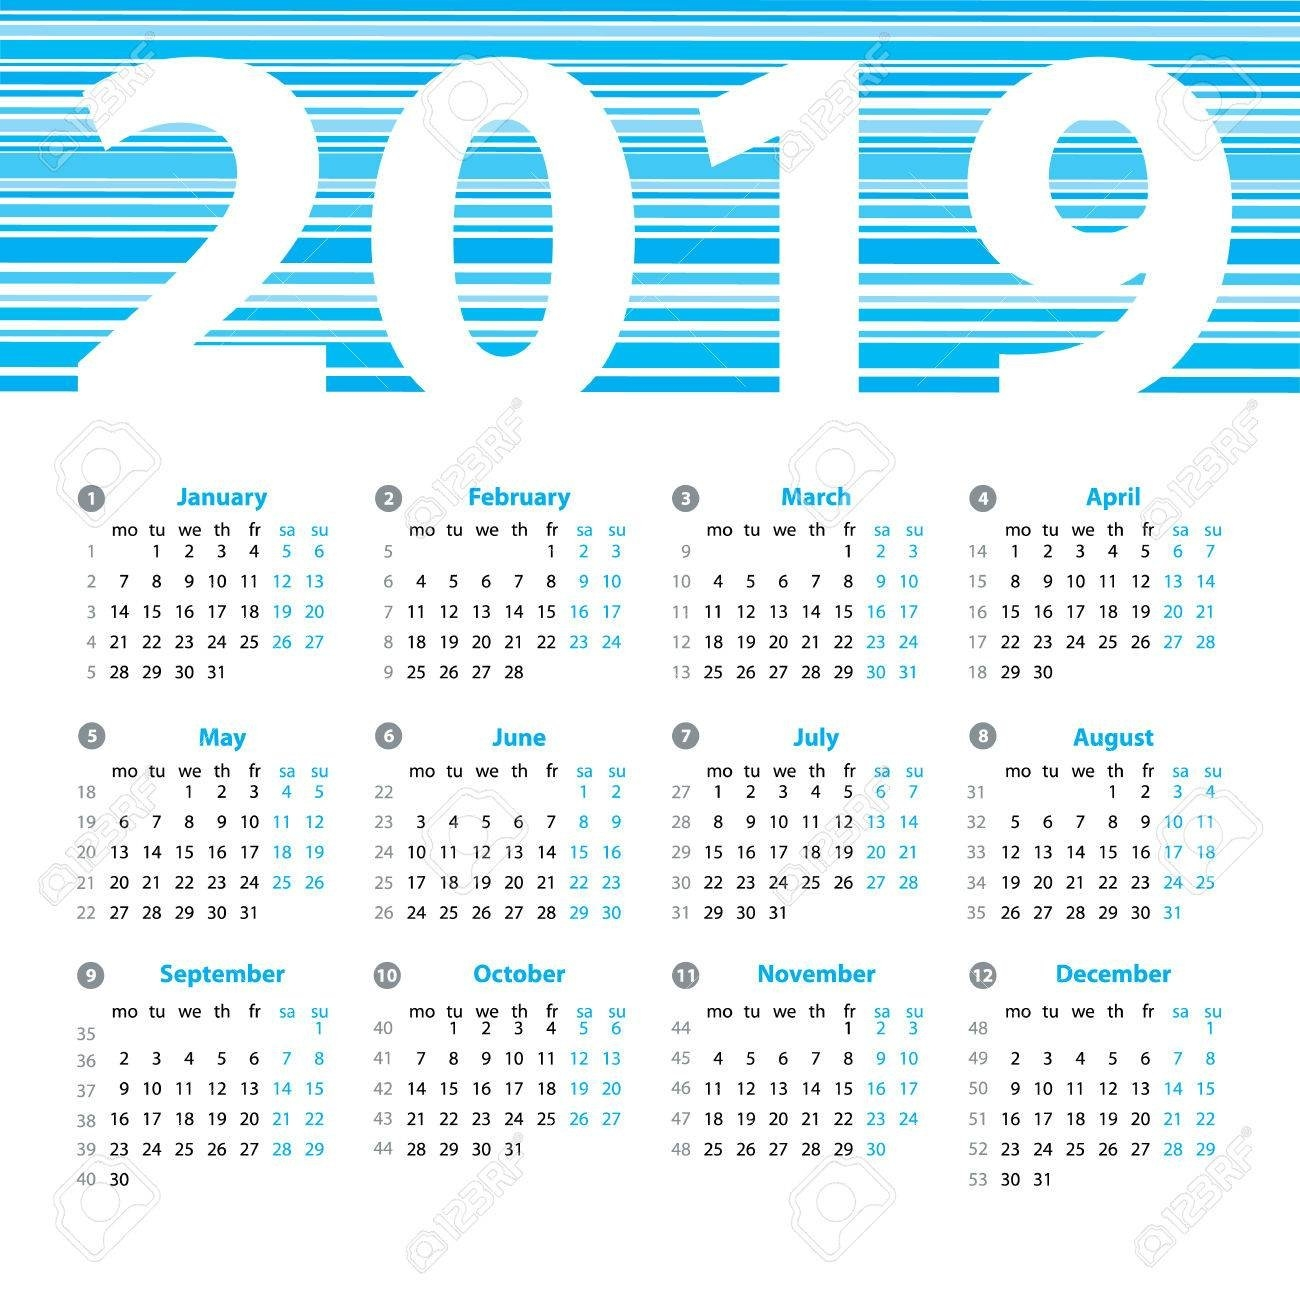 Calendar 2019 Year Vector Design Template With Week Numbers And Calendar Week 15 2019